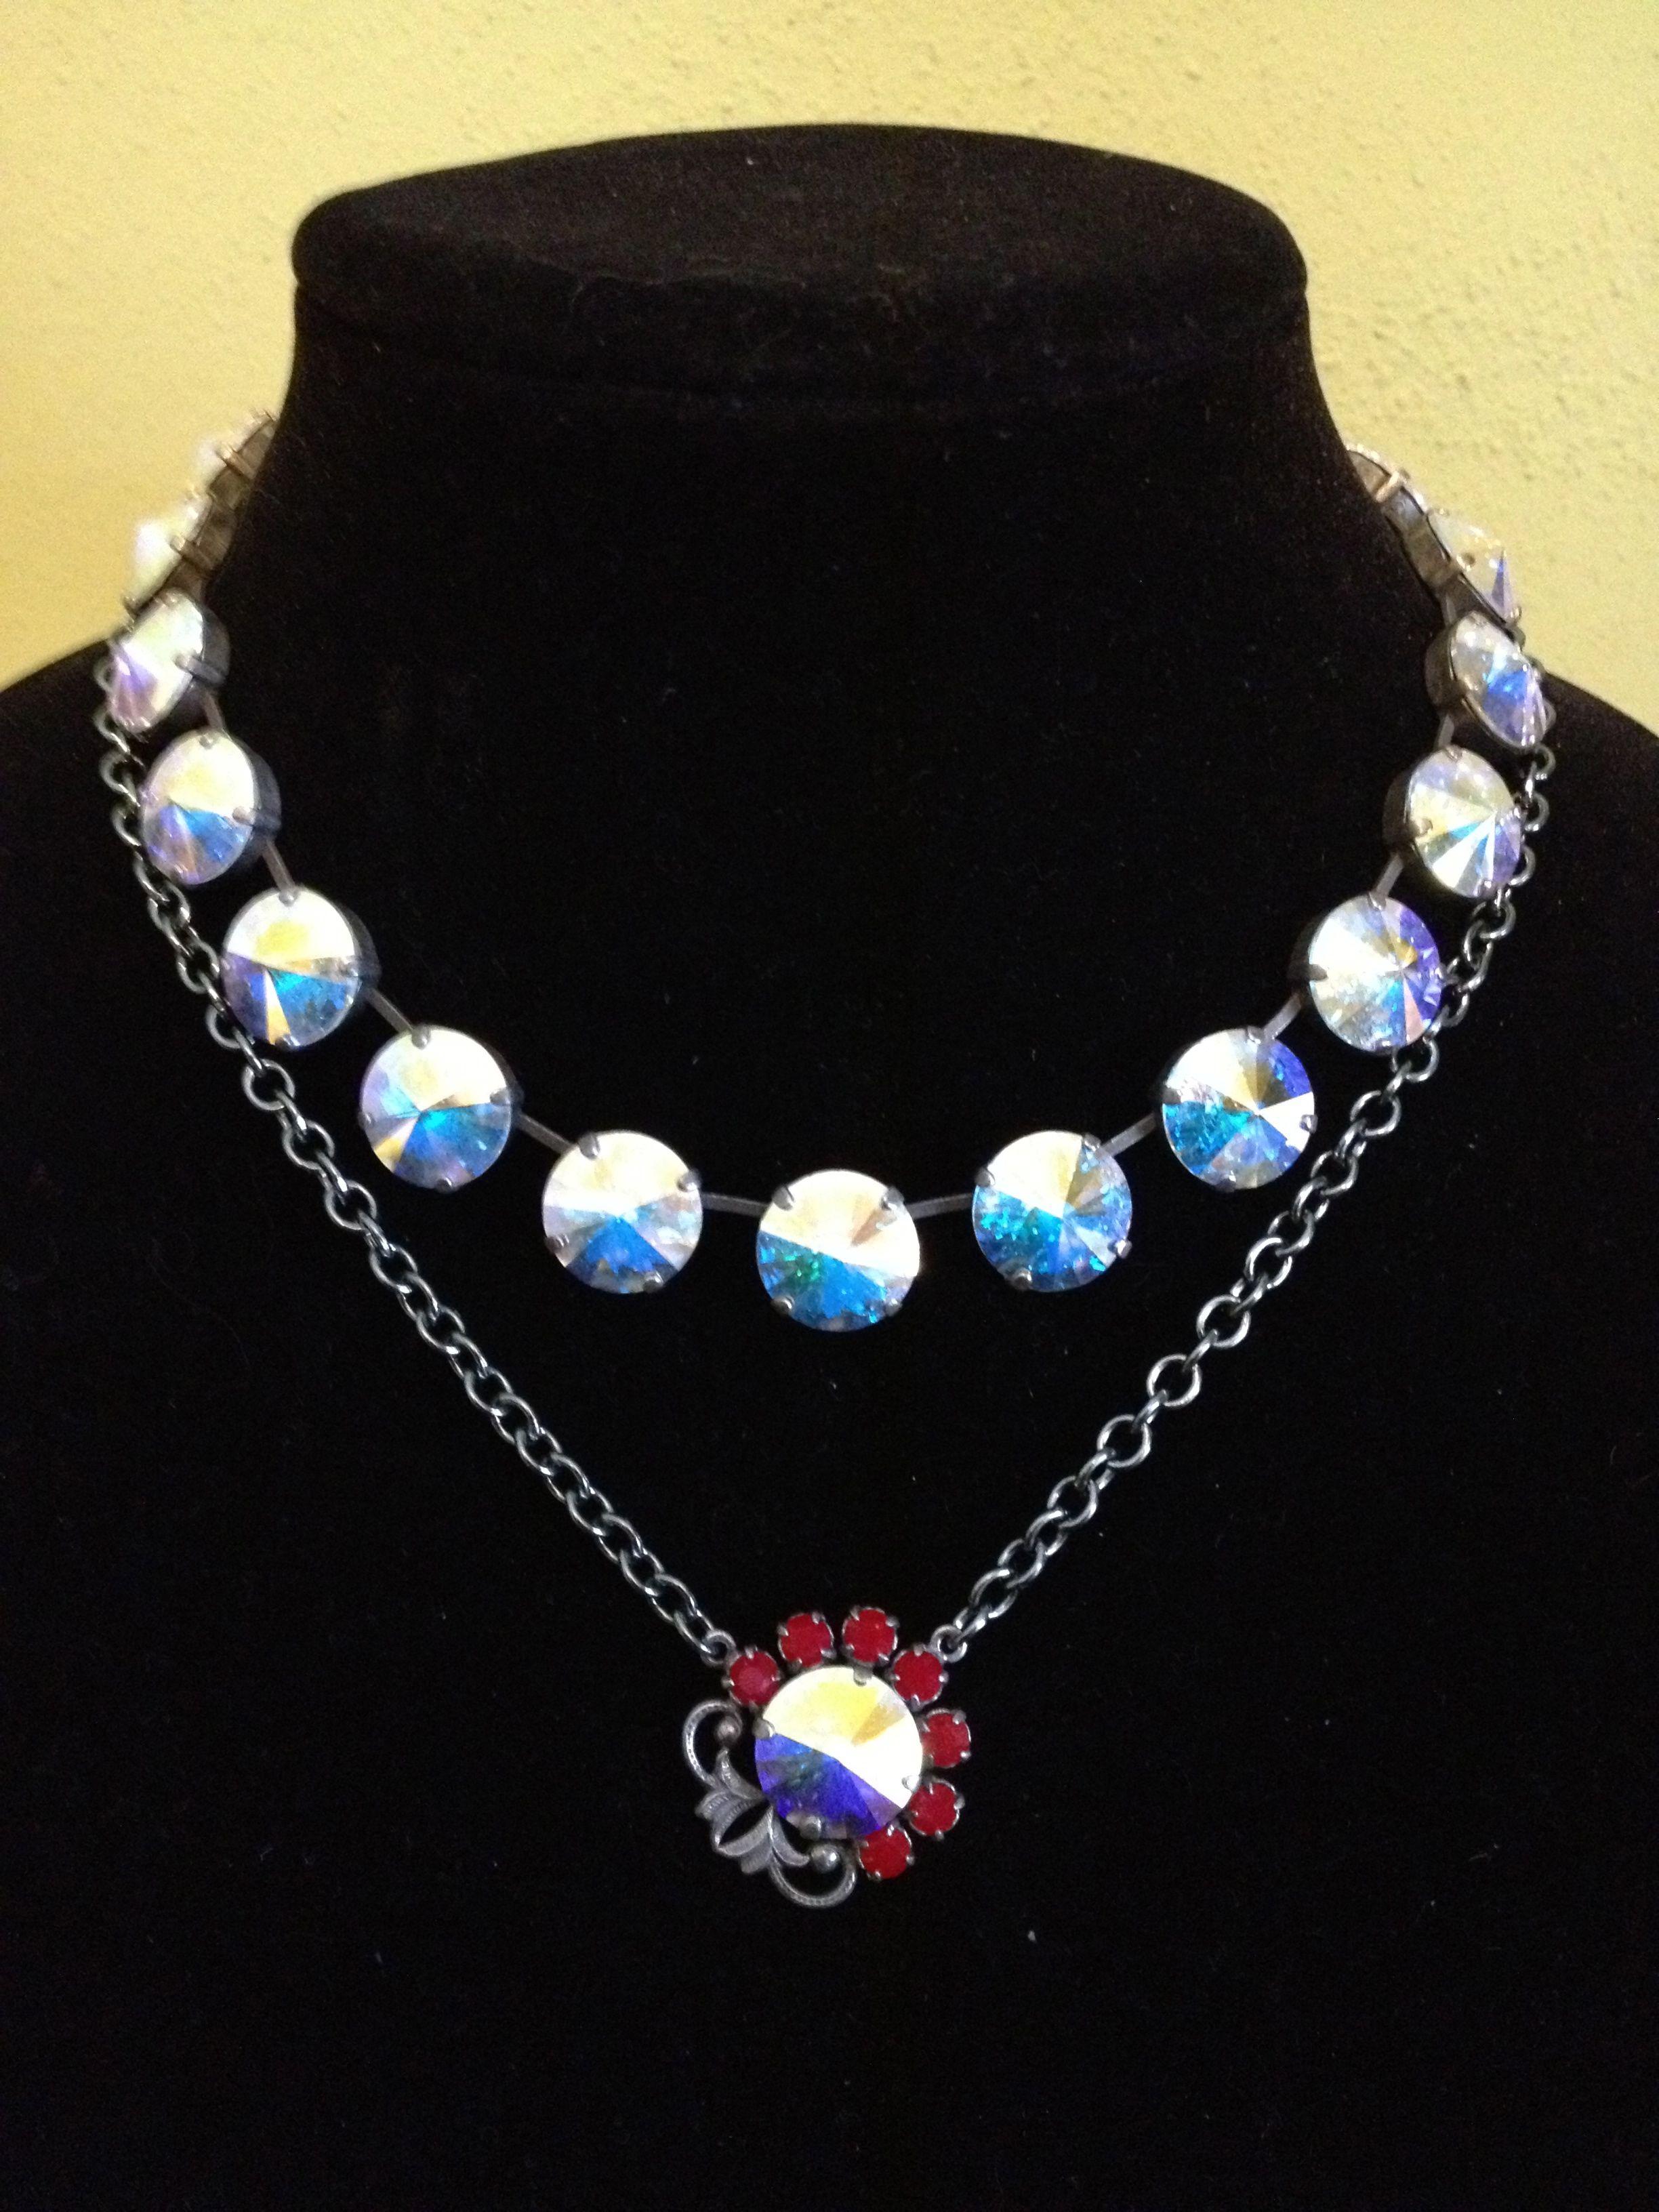 Sabika look necklace - Sabika W11 Anniversary Vienna Choker S13 Pearlized Flower Choker